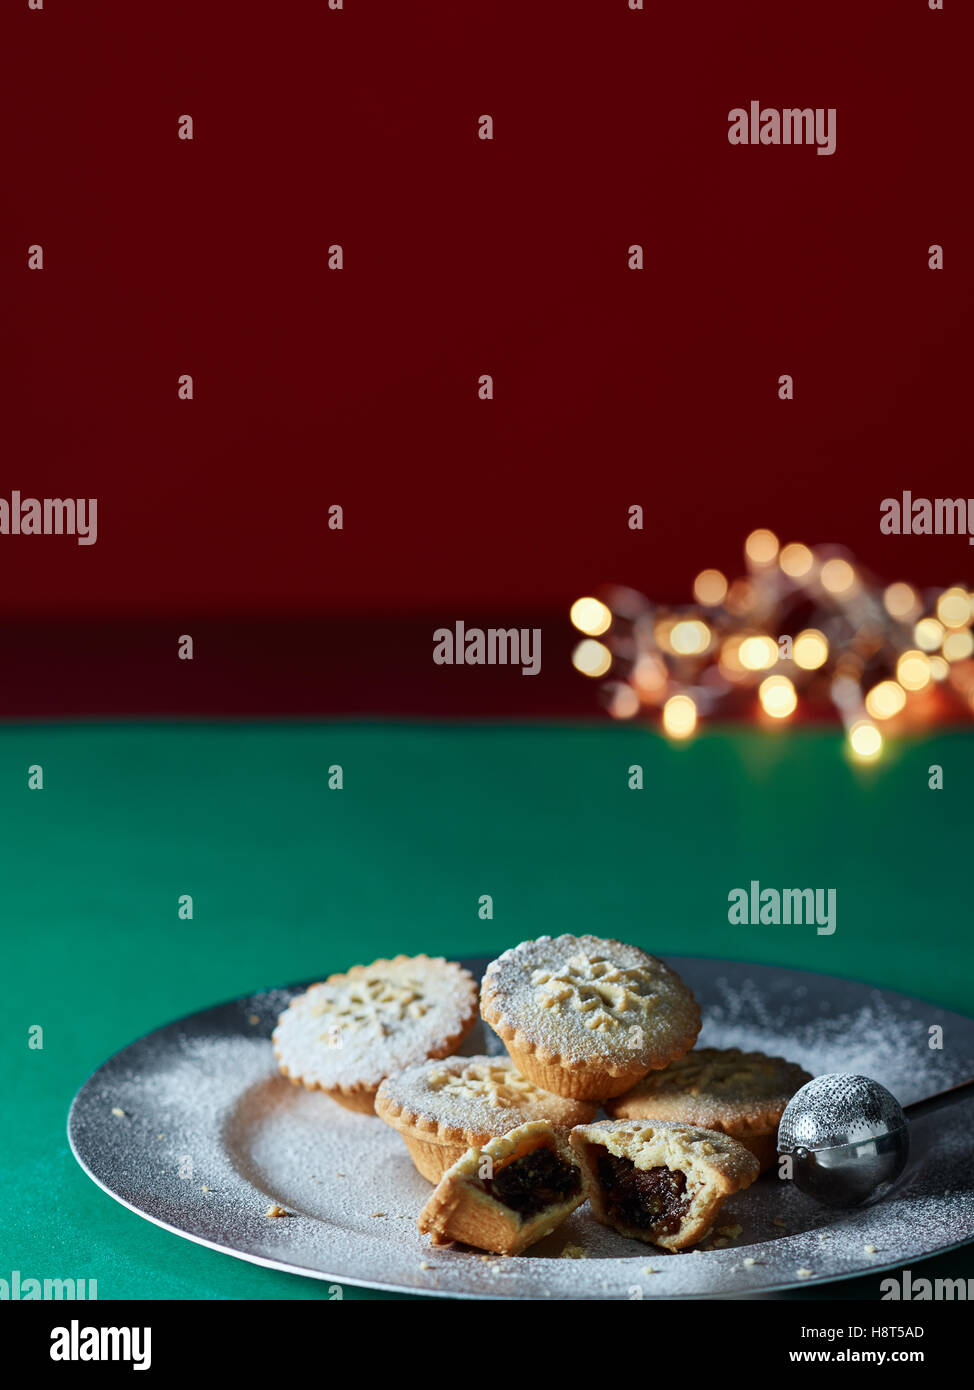 Mince pies and Christmas lights - Stock Image